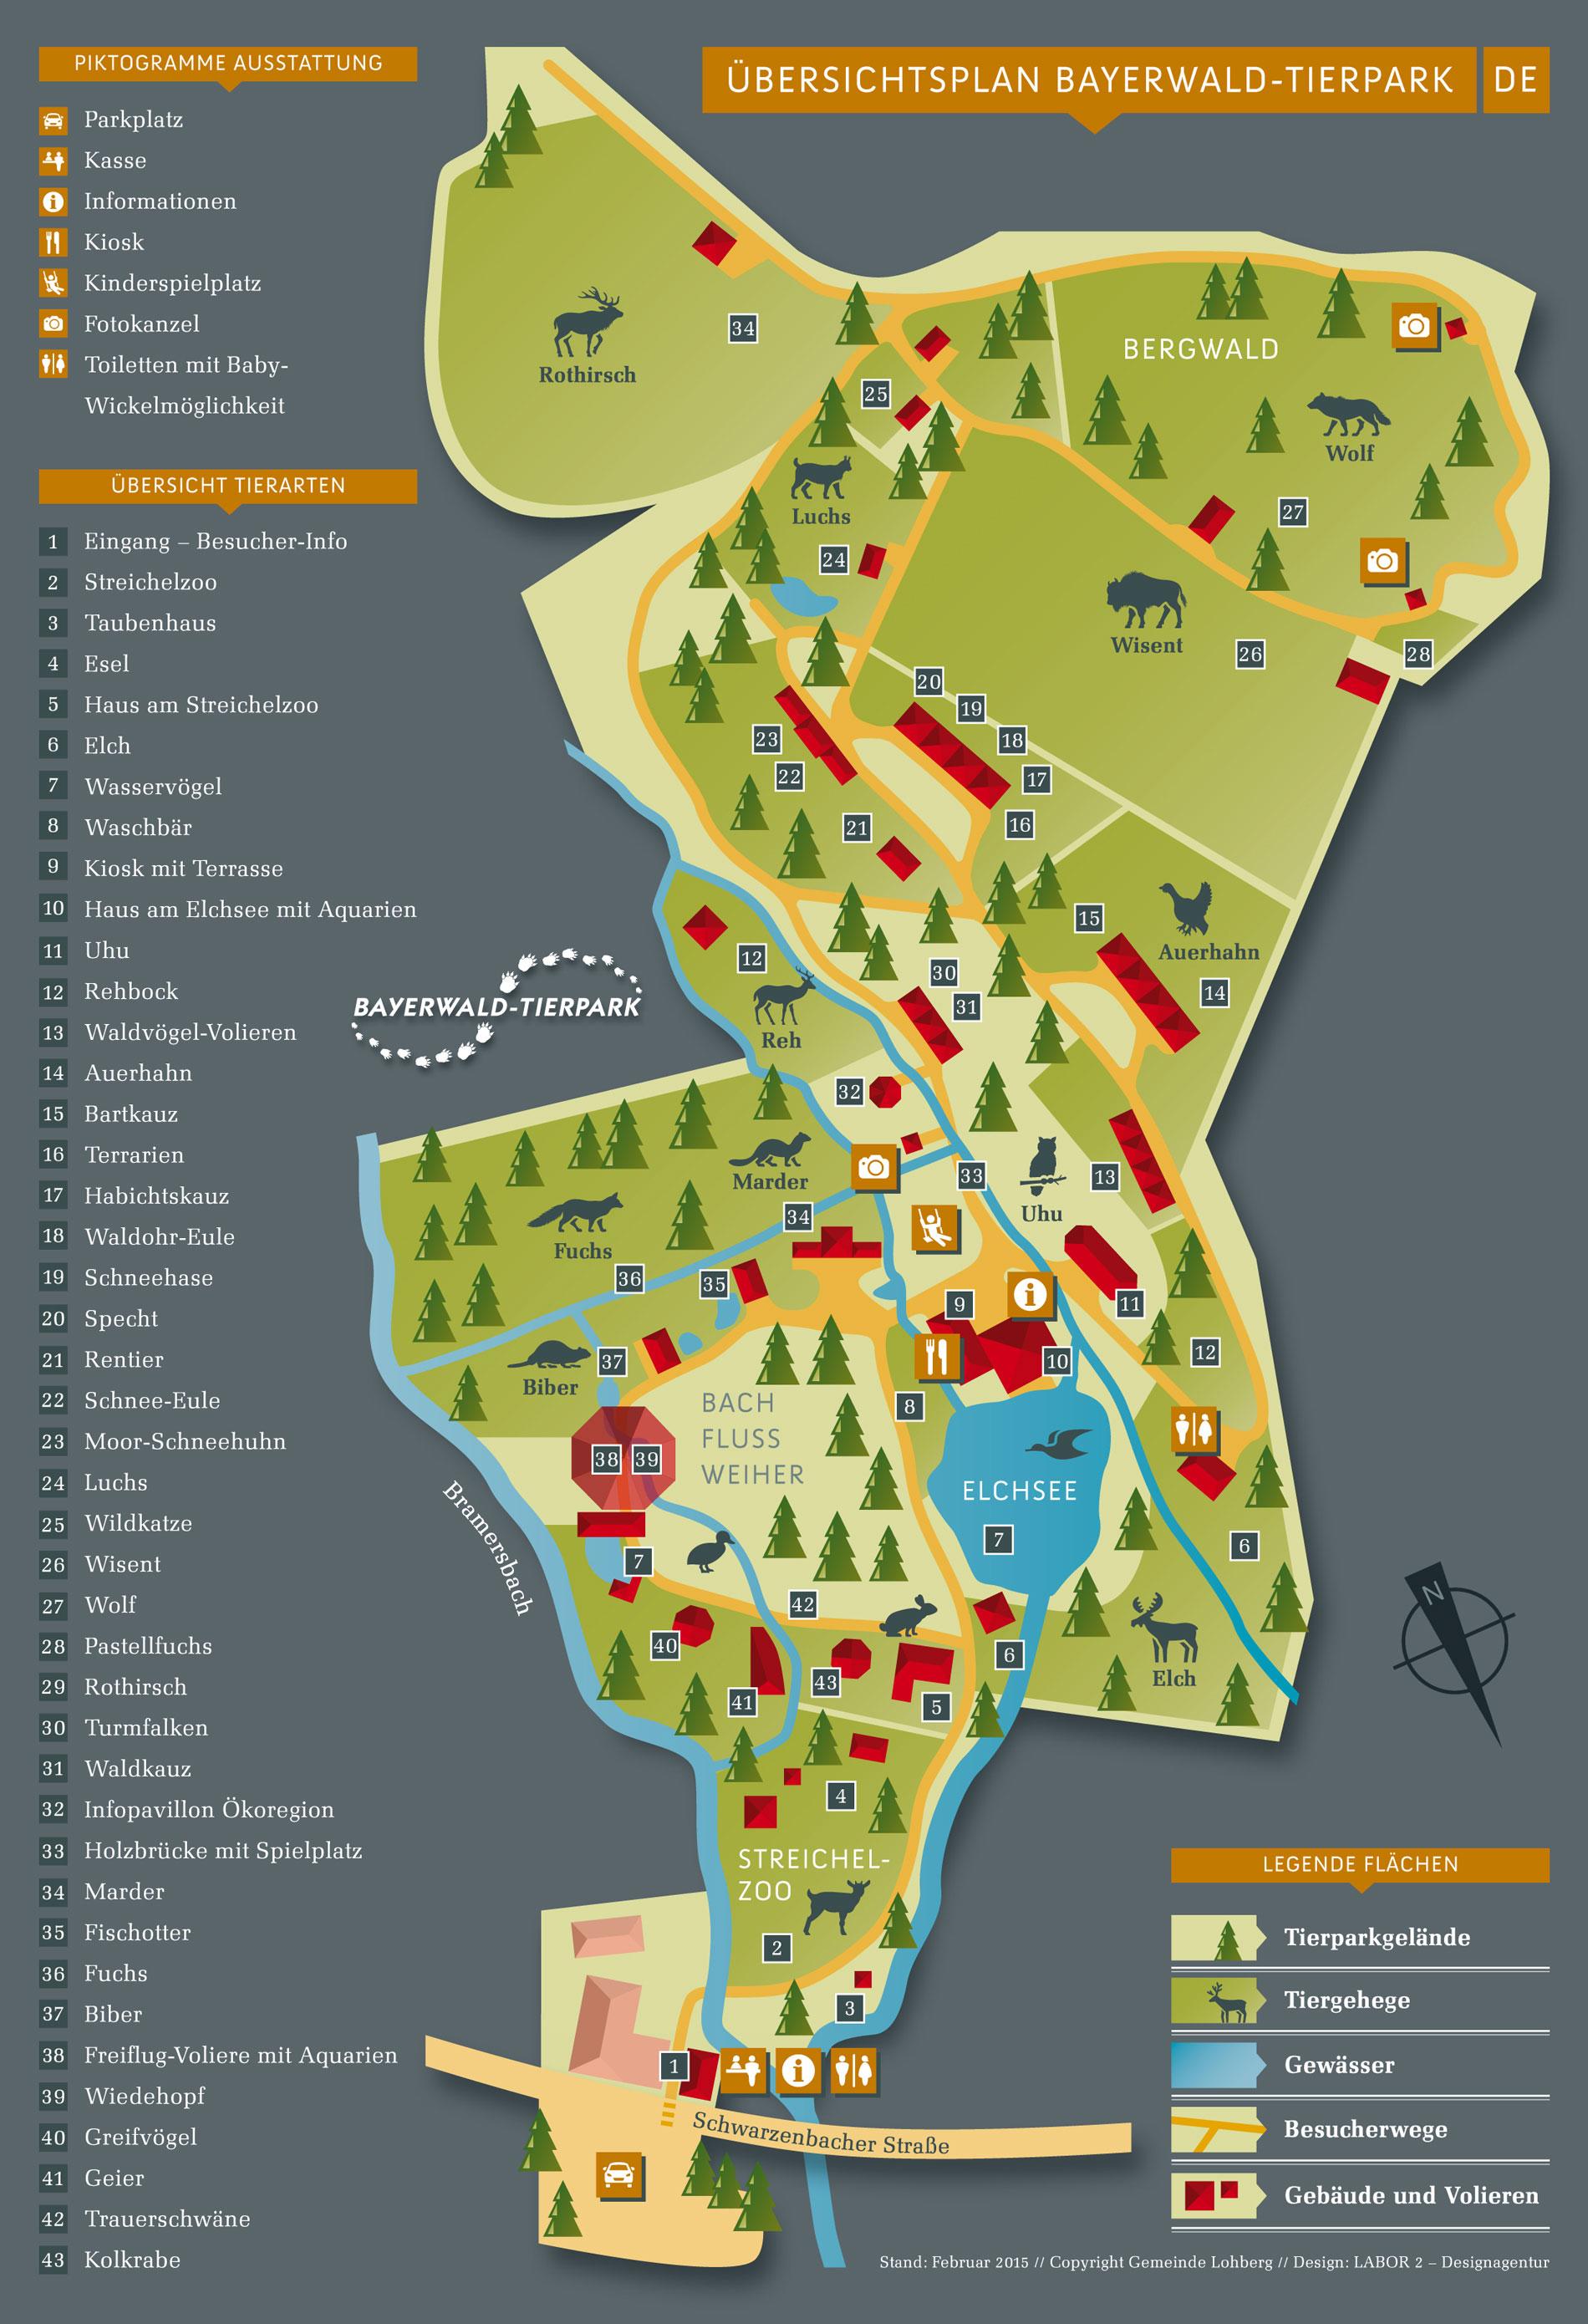 Plattegrond Bayerwald-Tierpark Lohberg (2016)